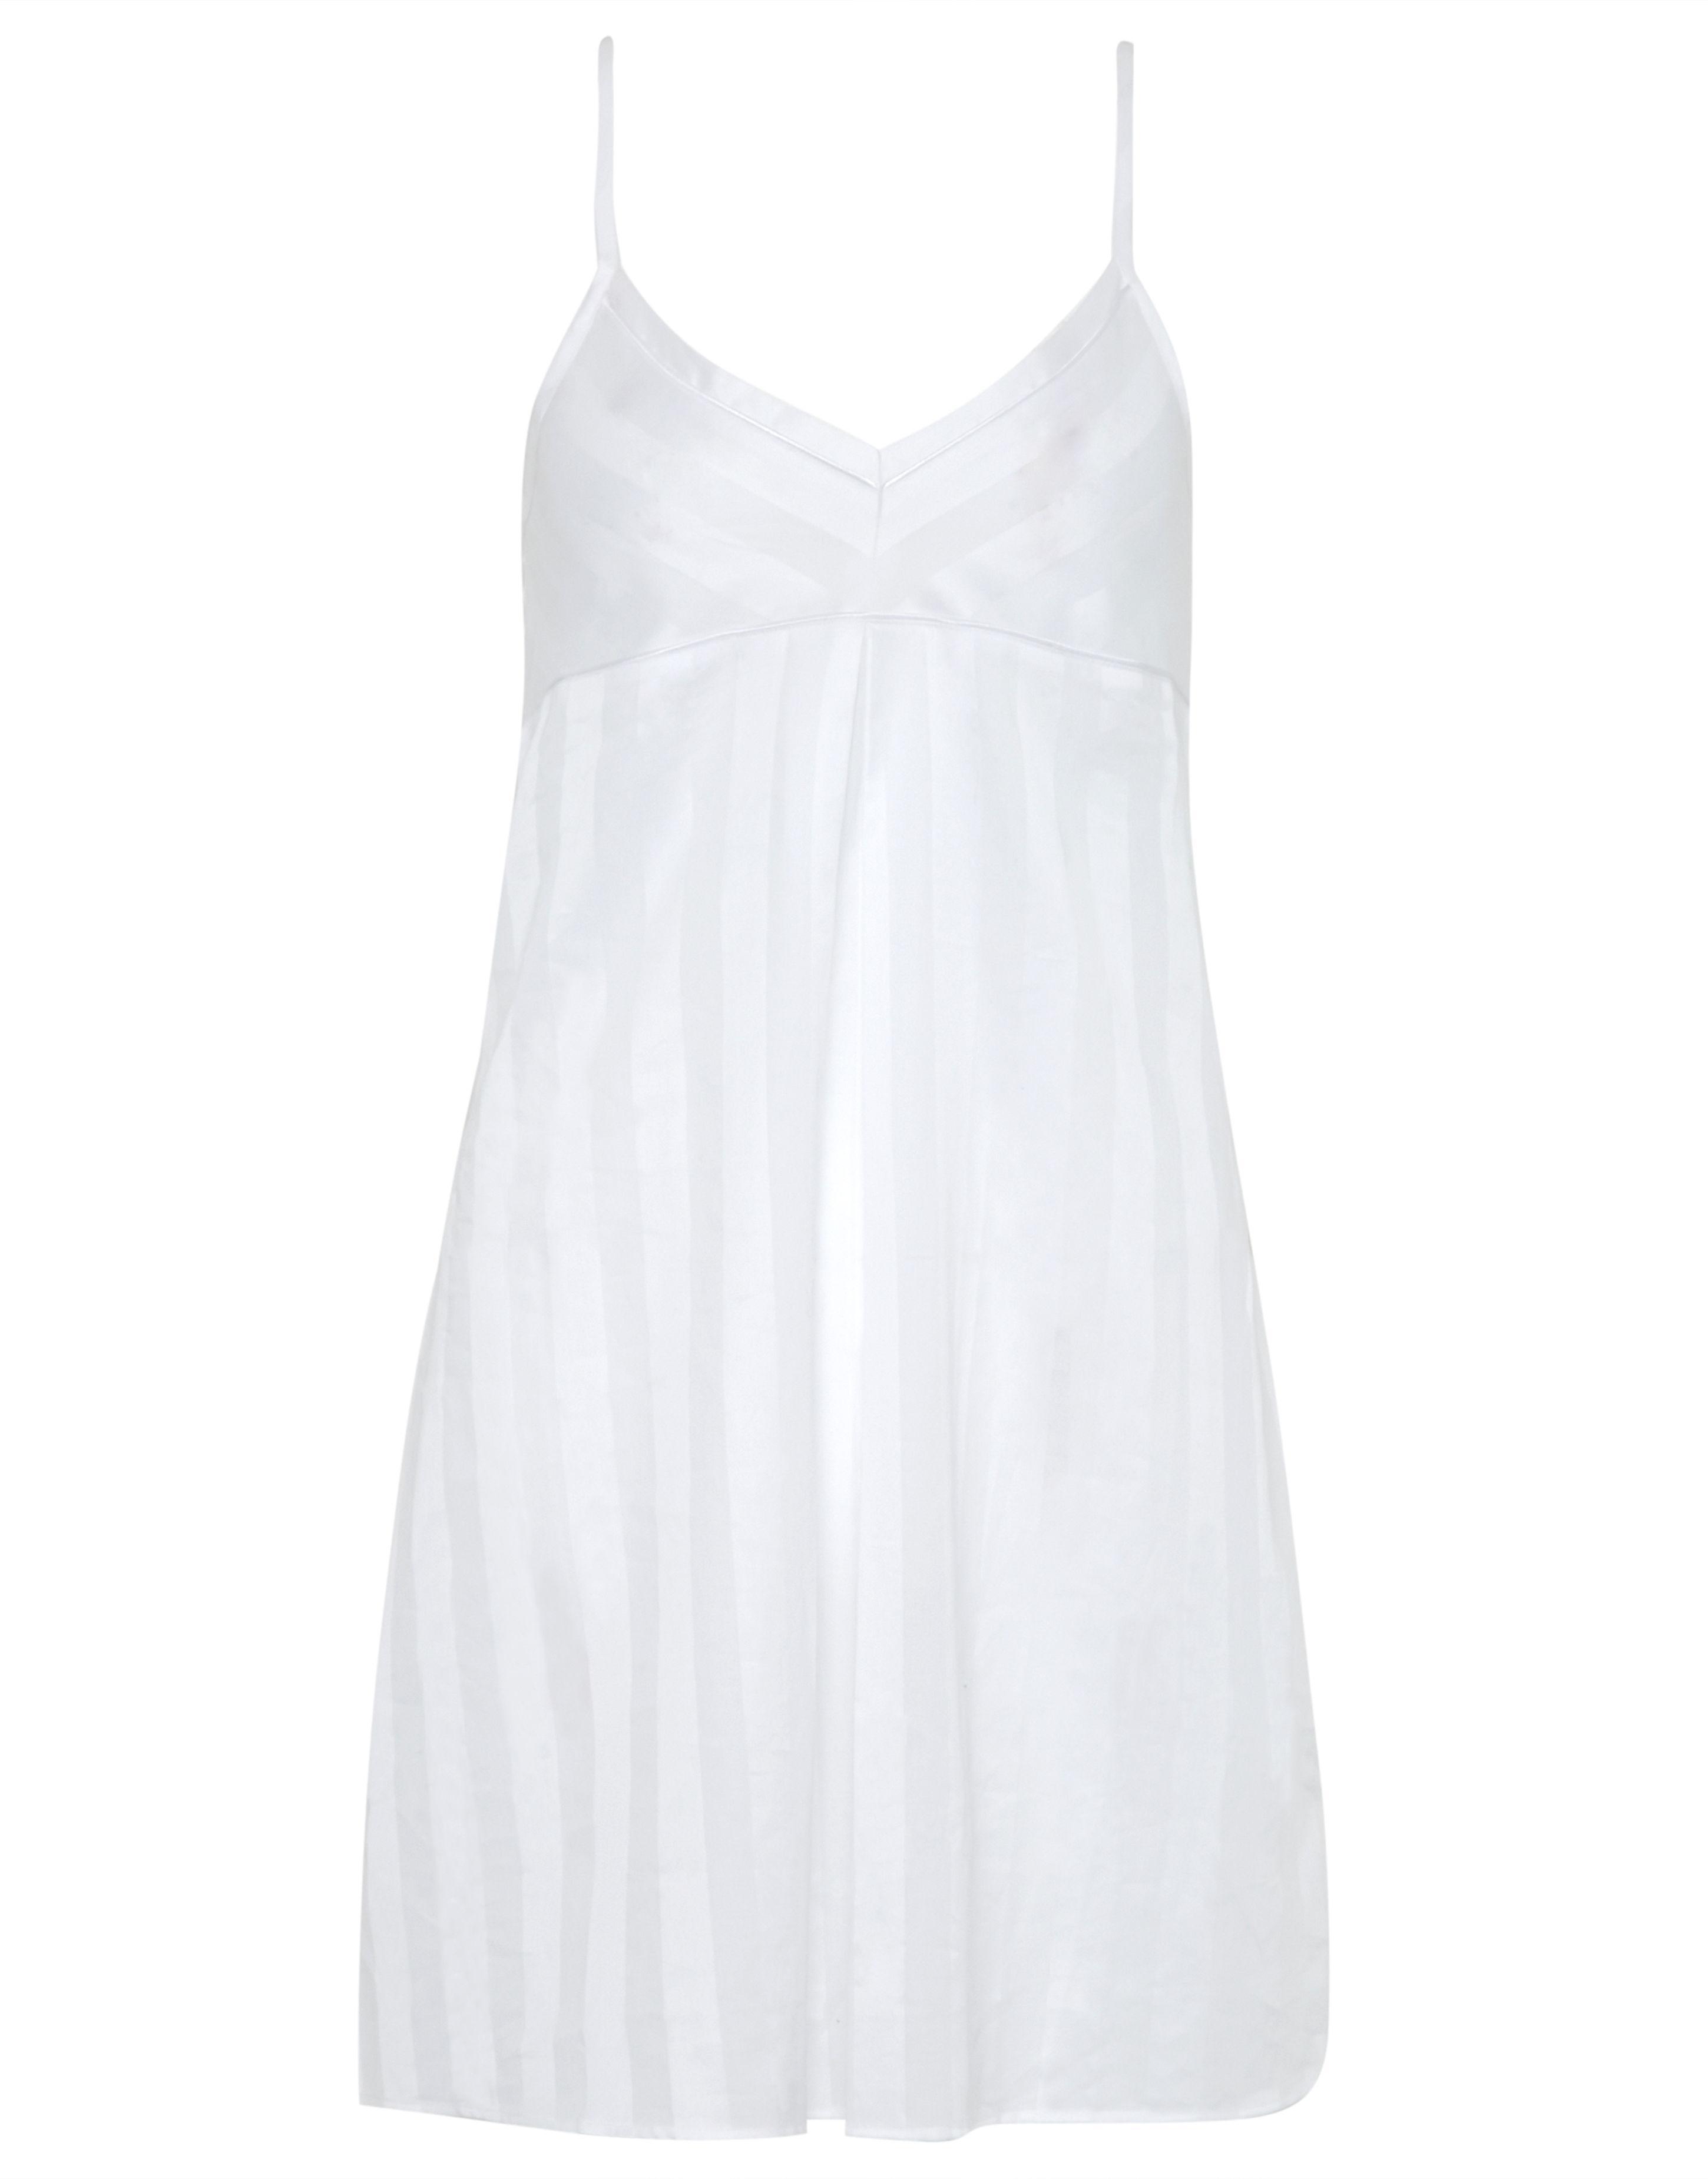 f4b3b7ee34 Bodas - White Cotton Nightwear Short Chemise - Lyst. View fullscreen